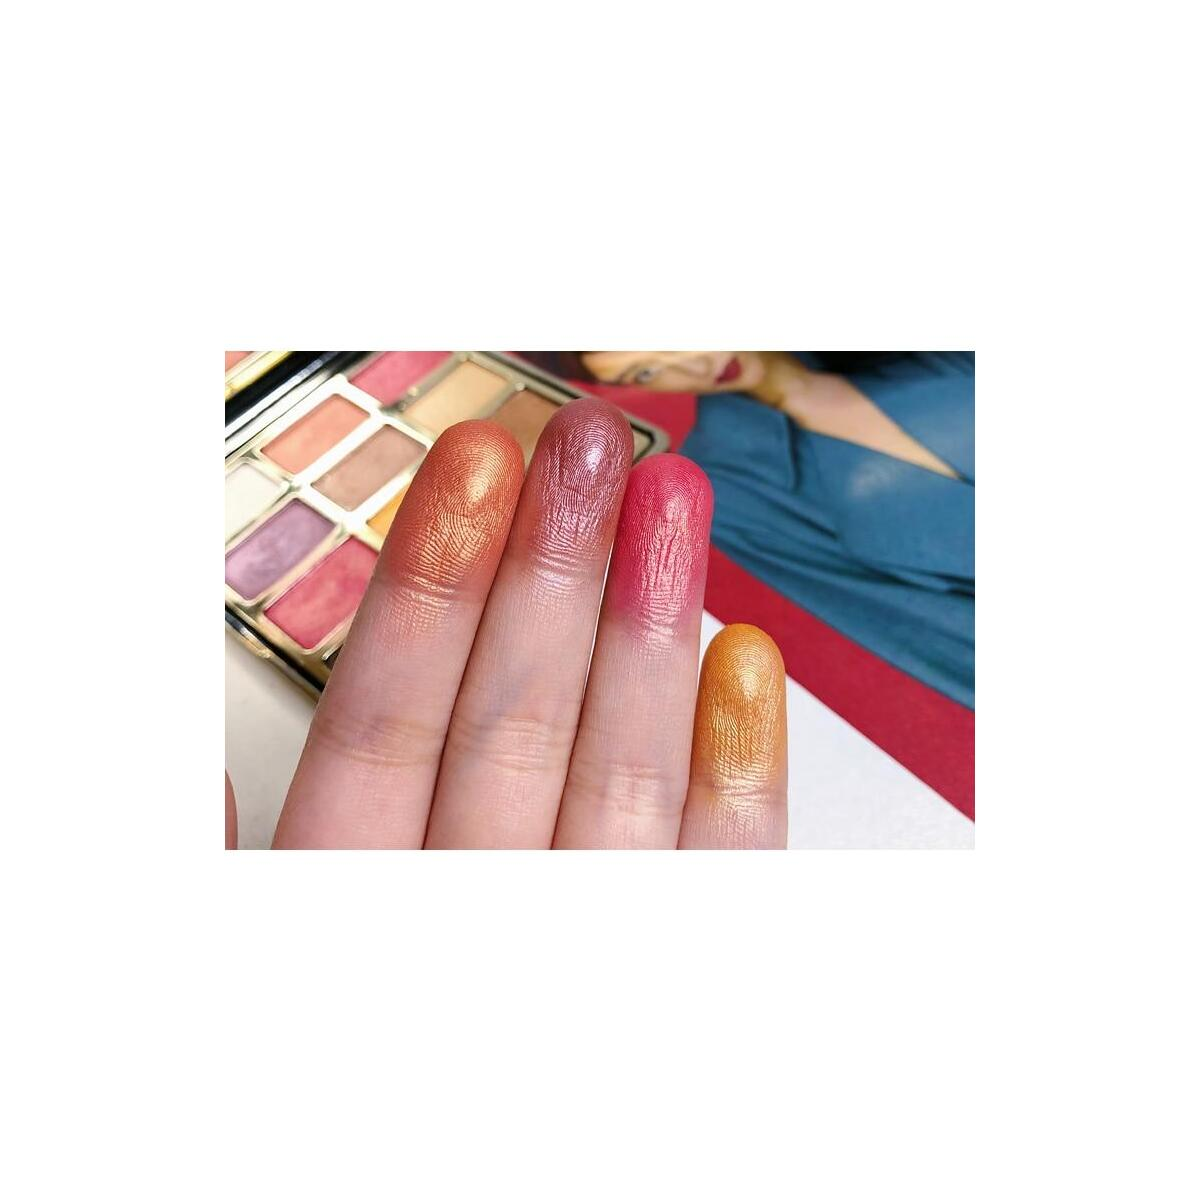 RomanticBird Febble Eyeshadow Diamond Glitter Metallic 12 Color Eyeshadow Palette, 01 / China